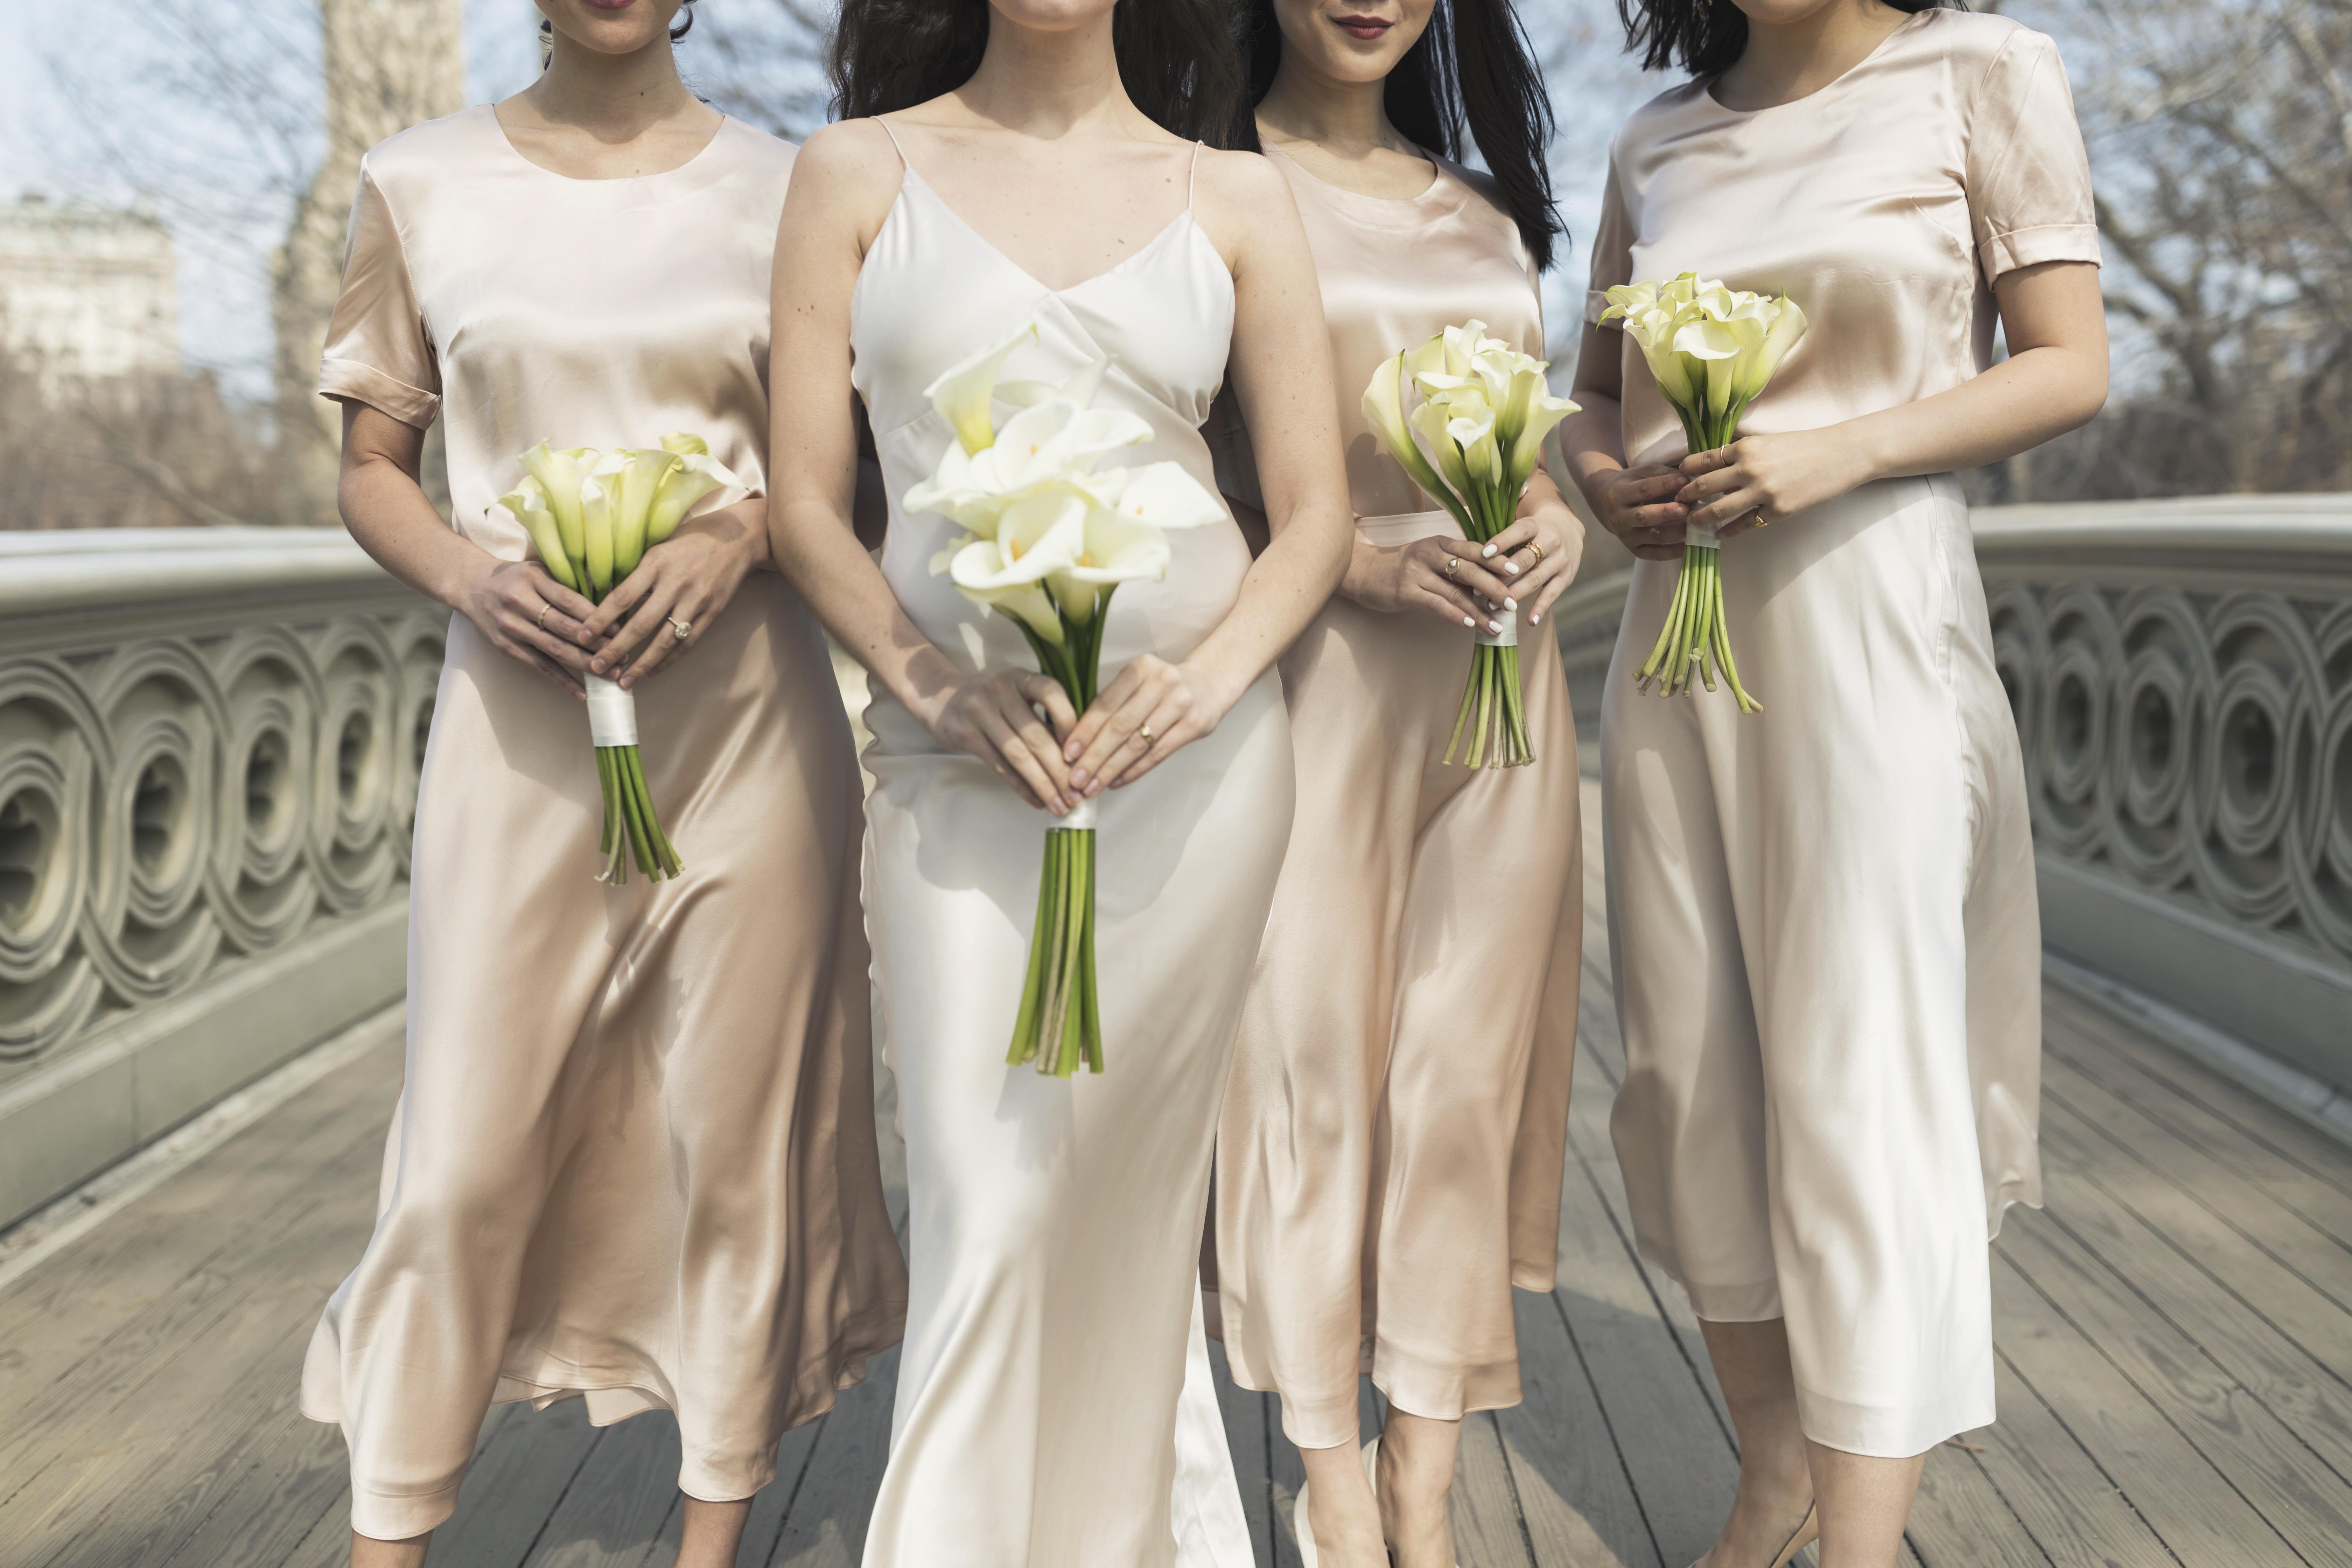 Leanne Ansar, Duan Mackenzie, YouMe Lin, Lisa Chen